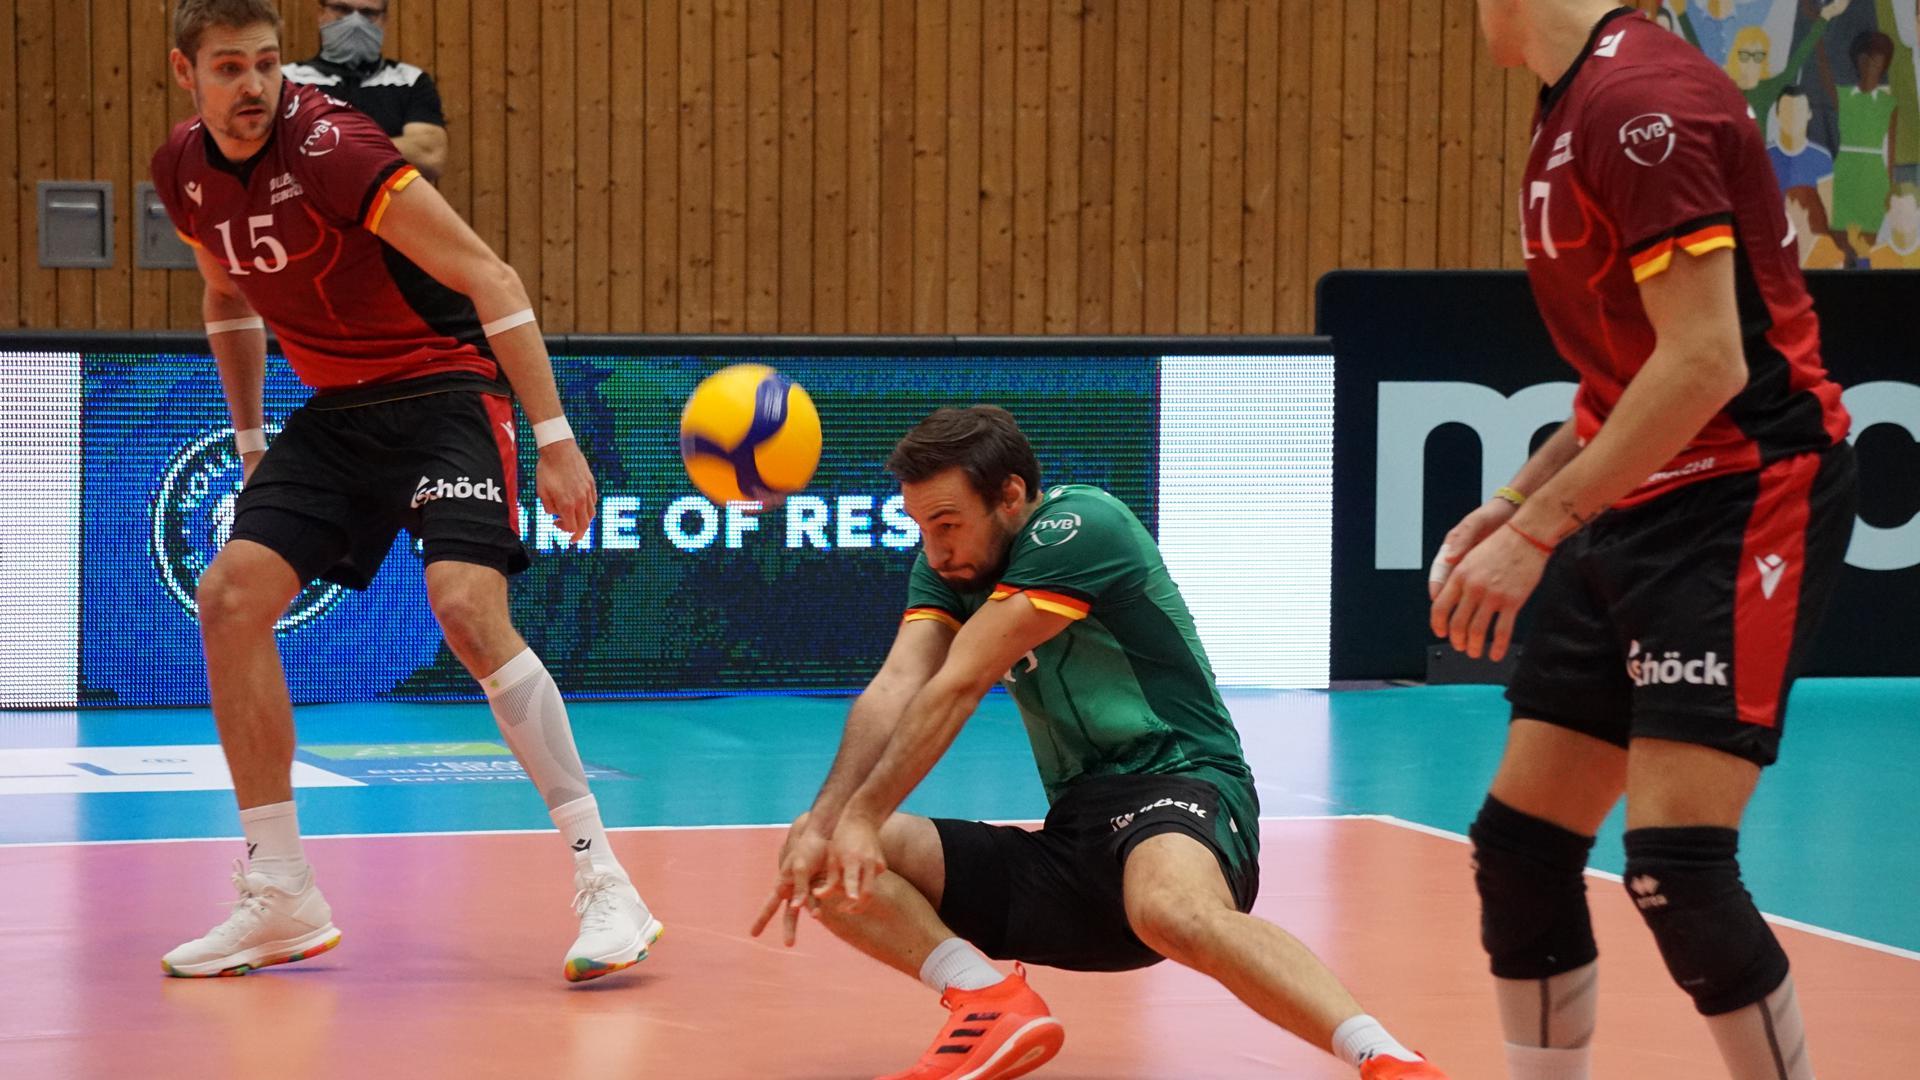 Volleyball-Bundesliga 2020/21, Netzhoppers Königs Wusterhausen - Bisons Bühl 1:3